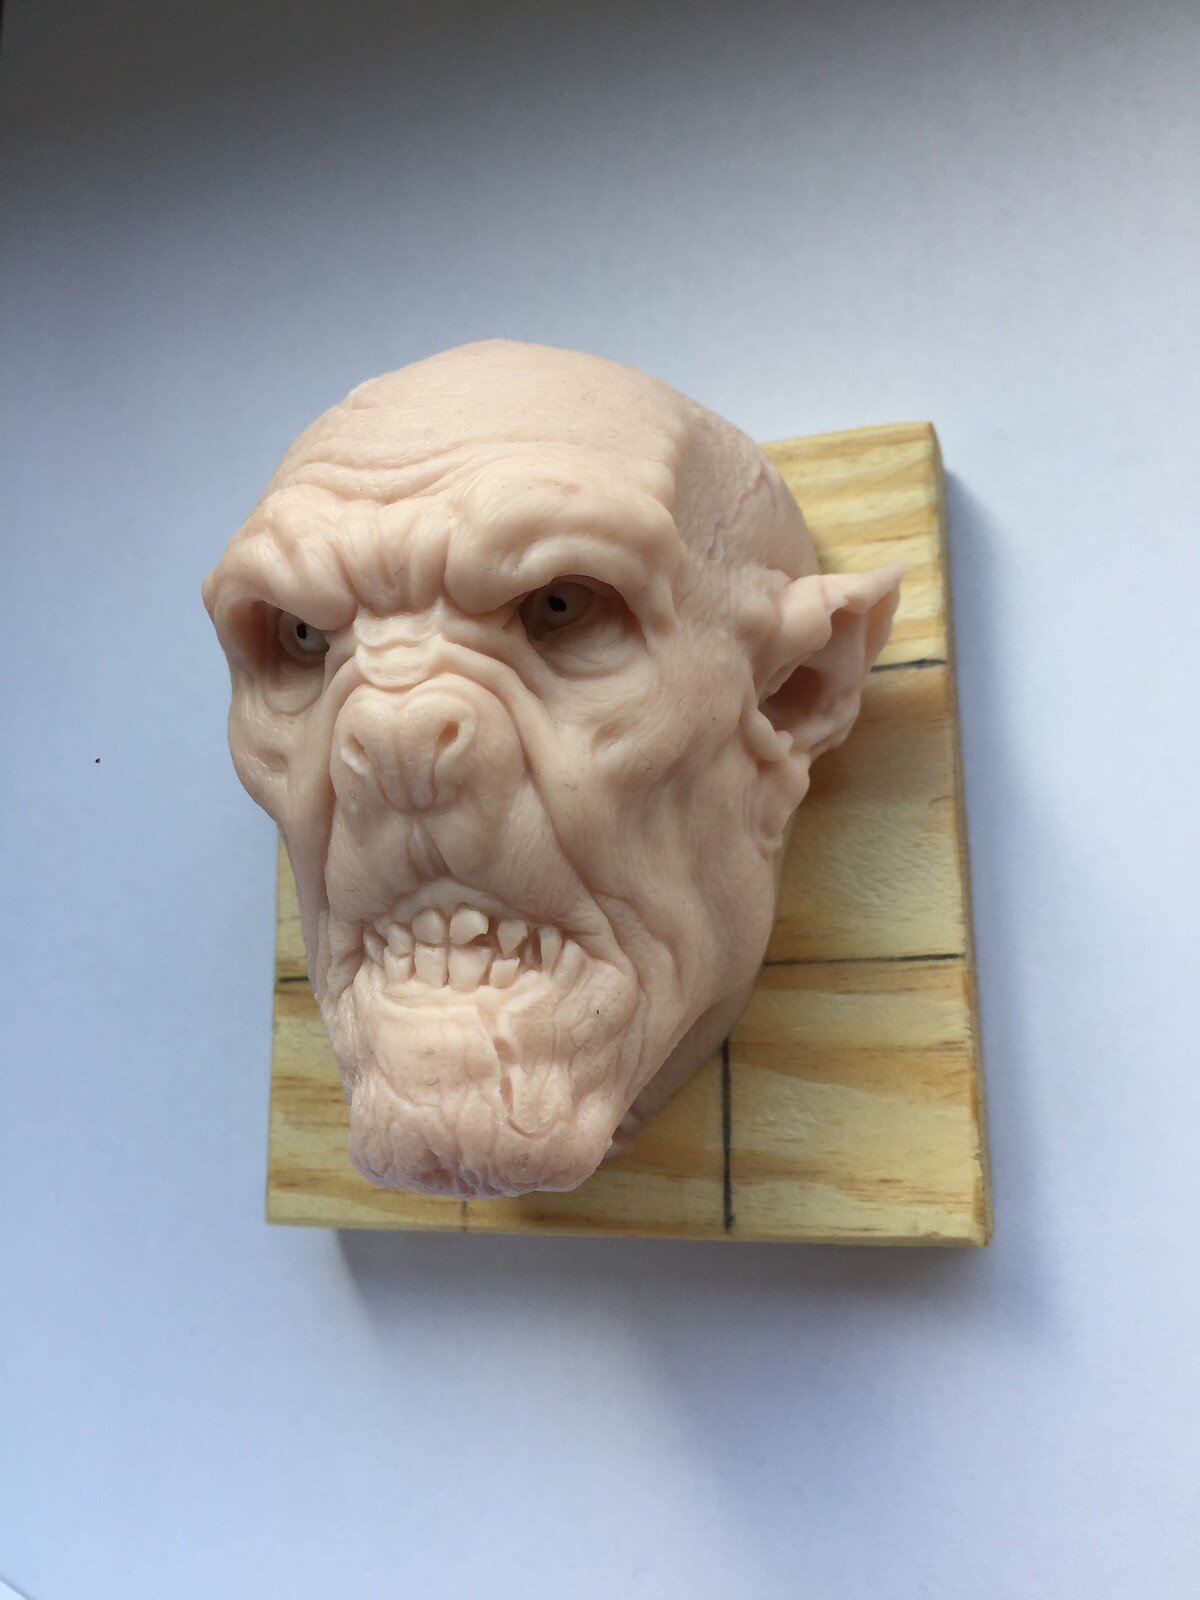 Vampire/Dracula polimer clay sculptur.